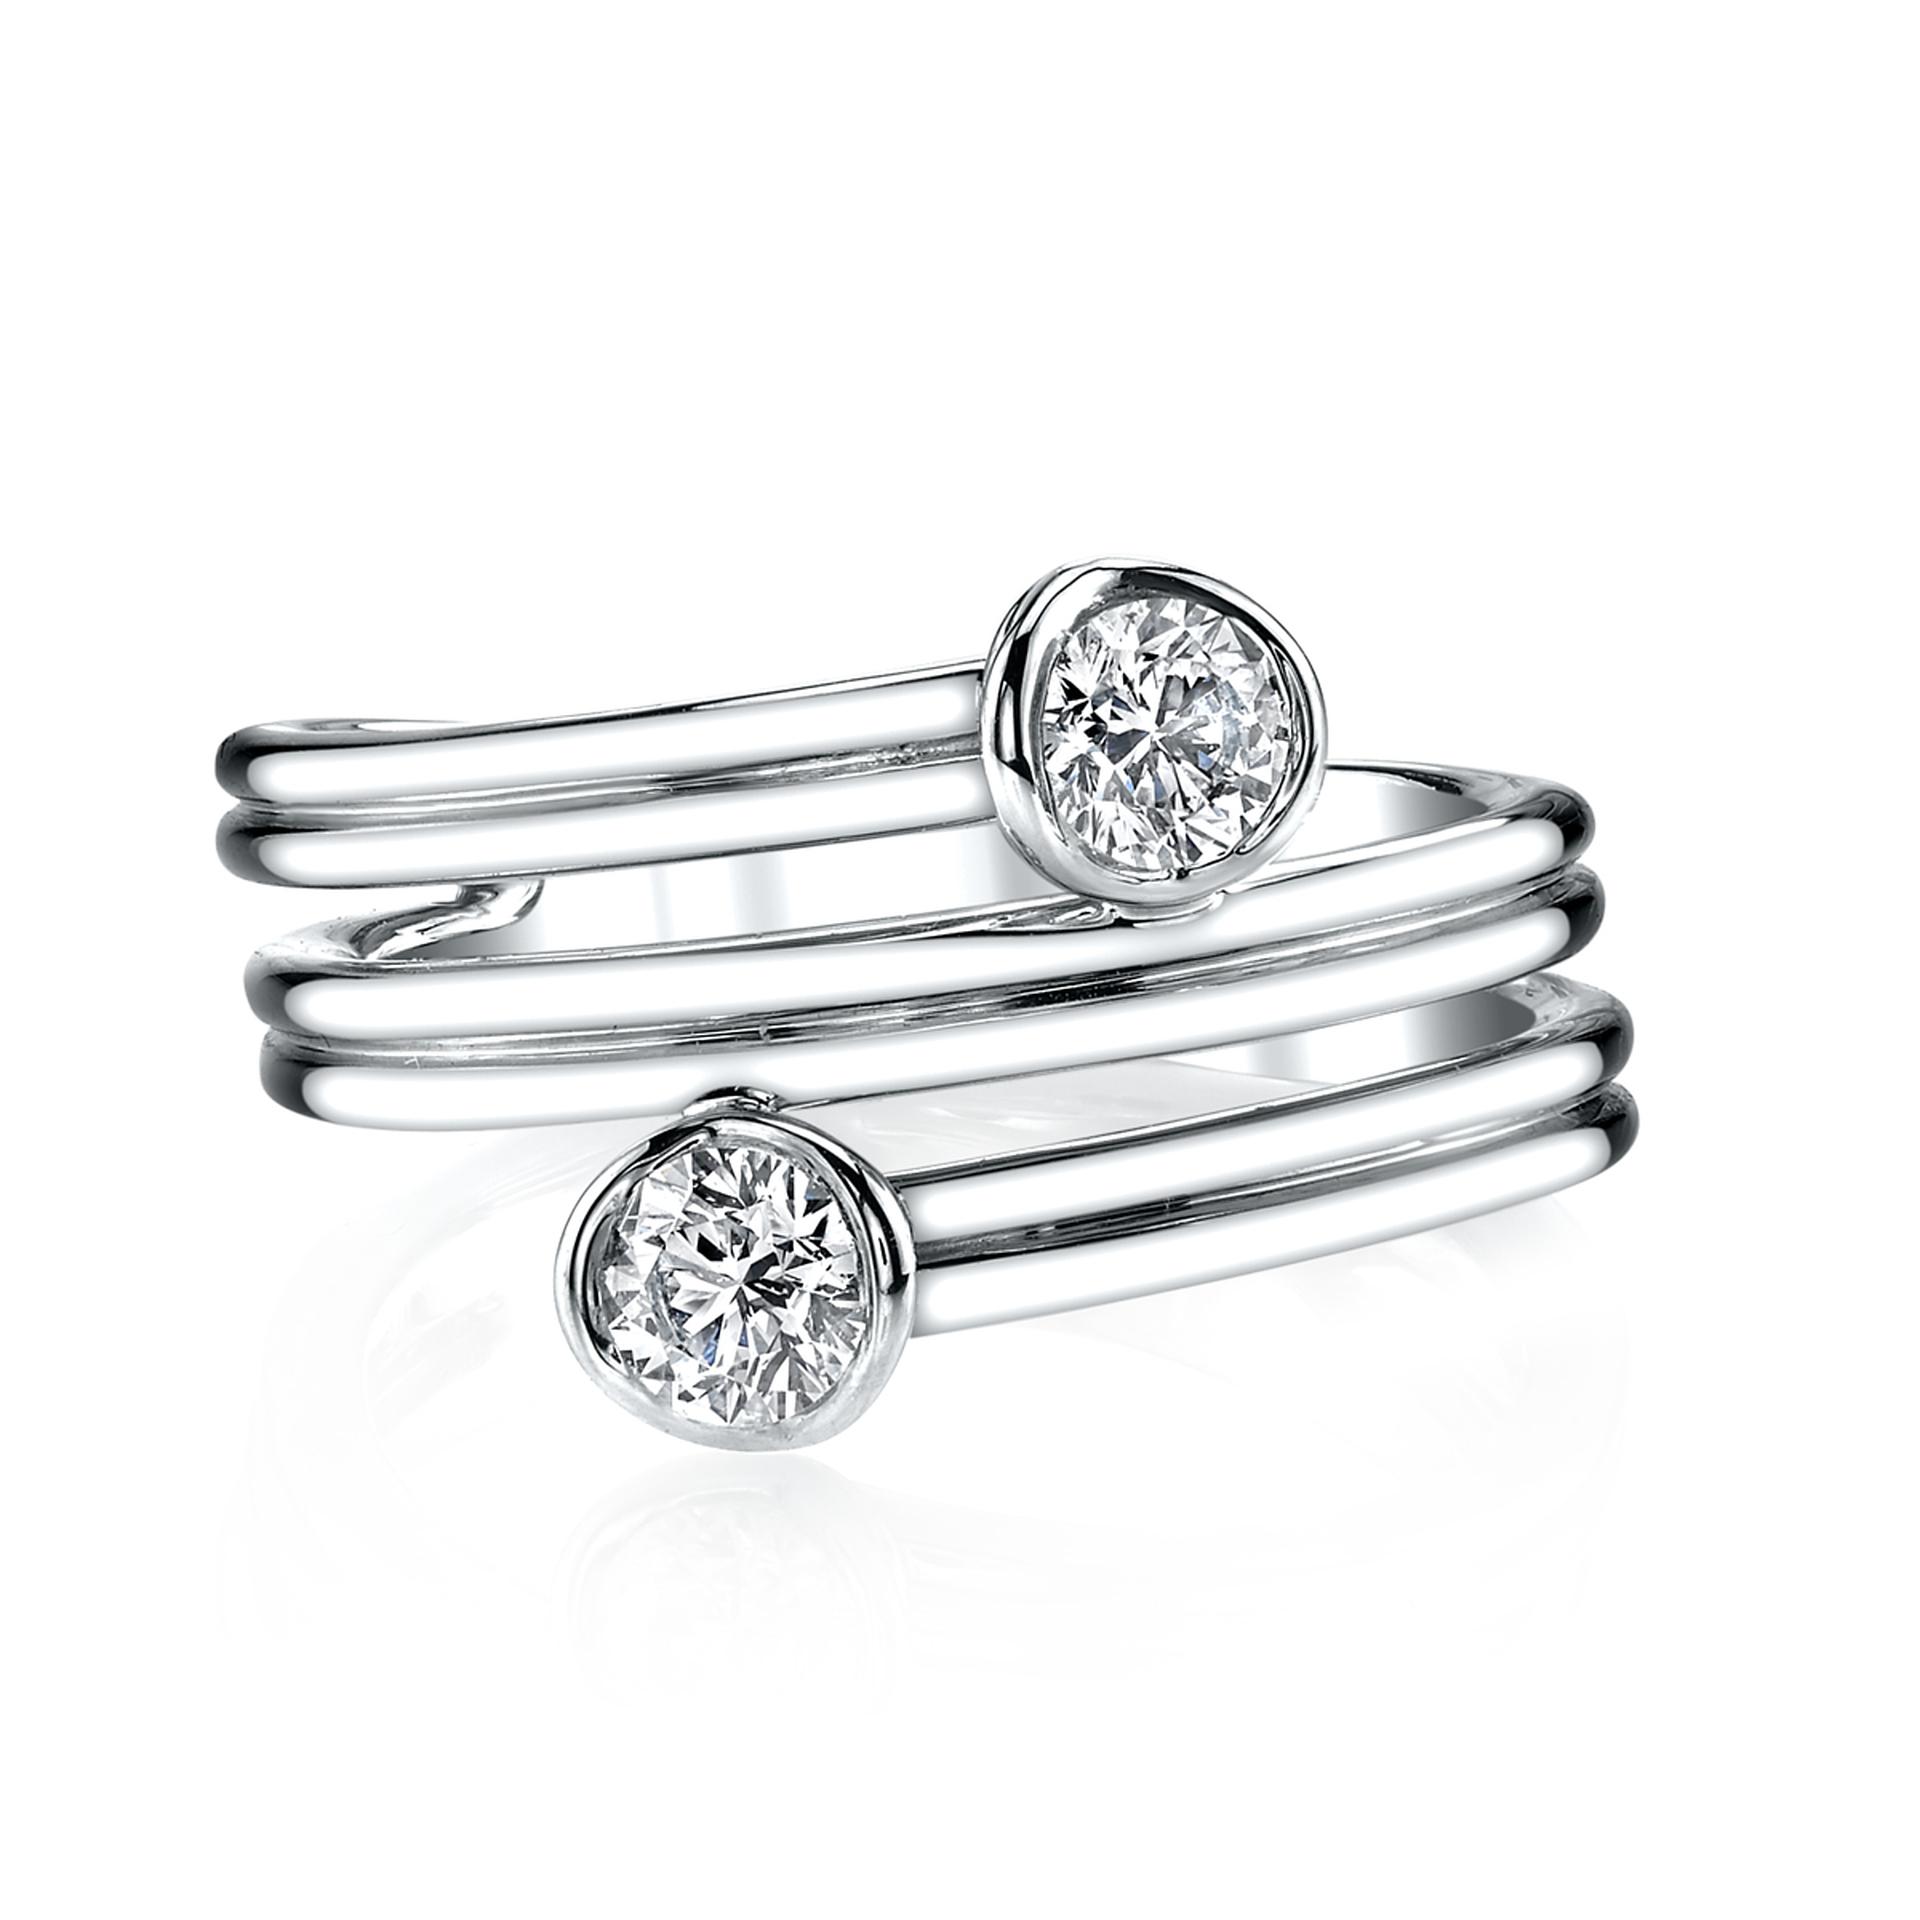 18ct White Gold Sirena Diamond Ring